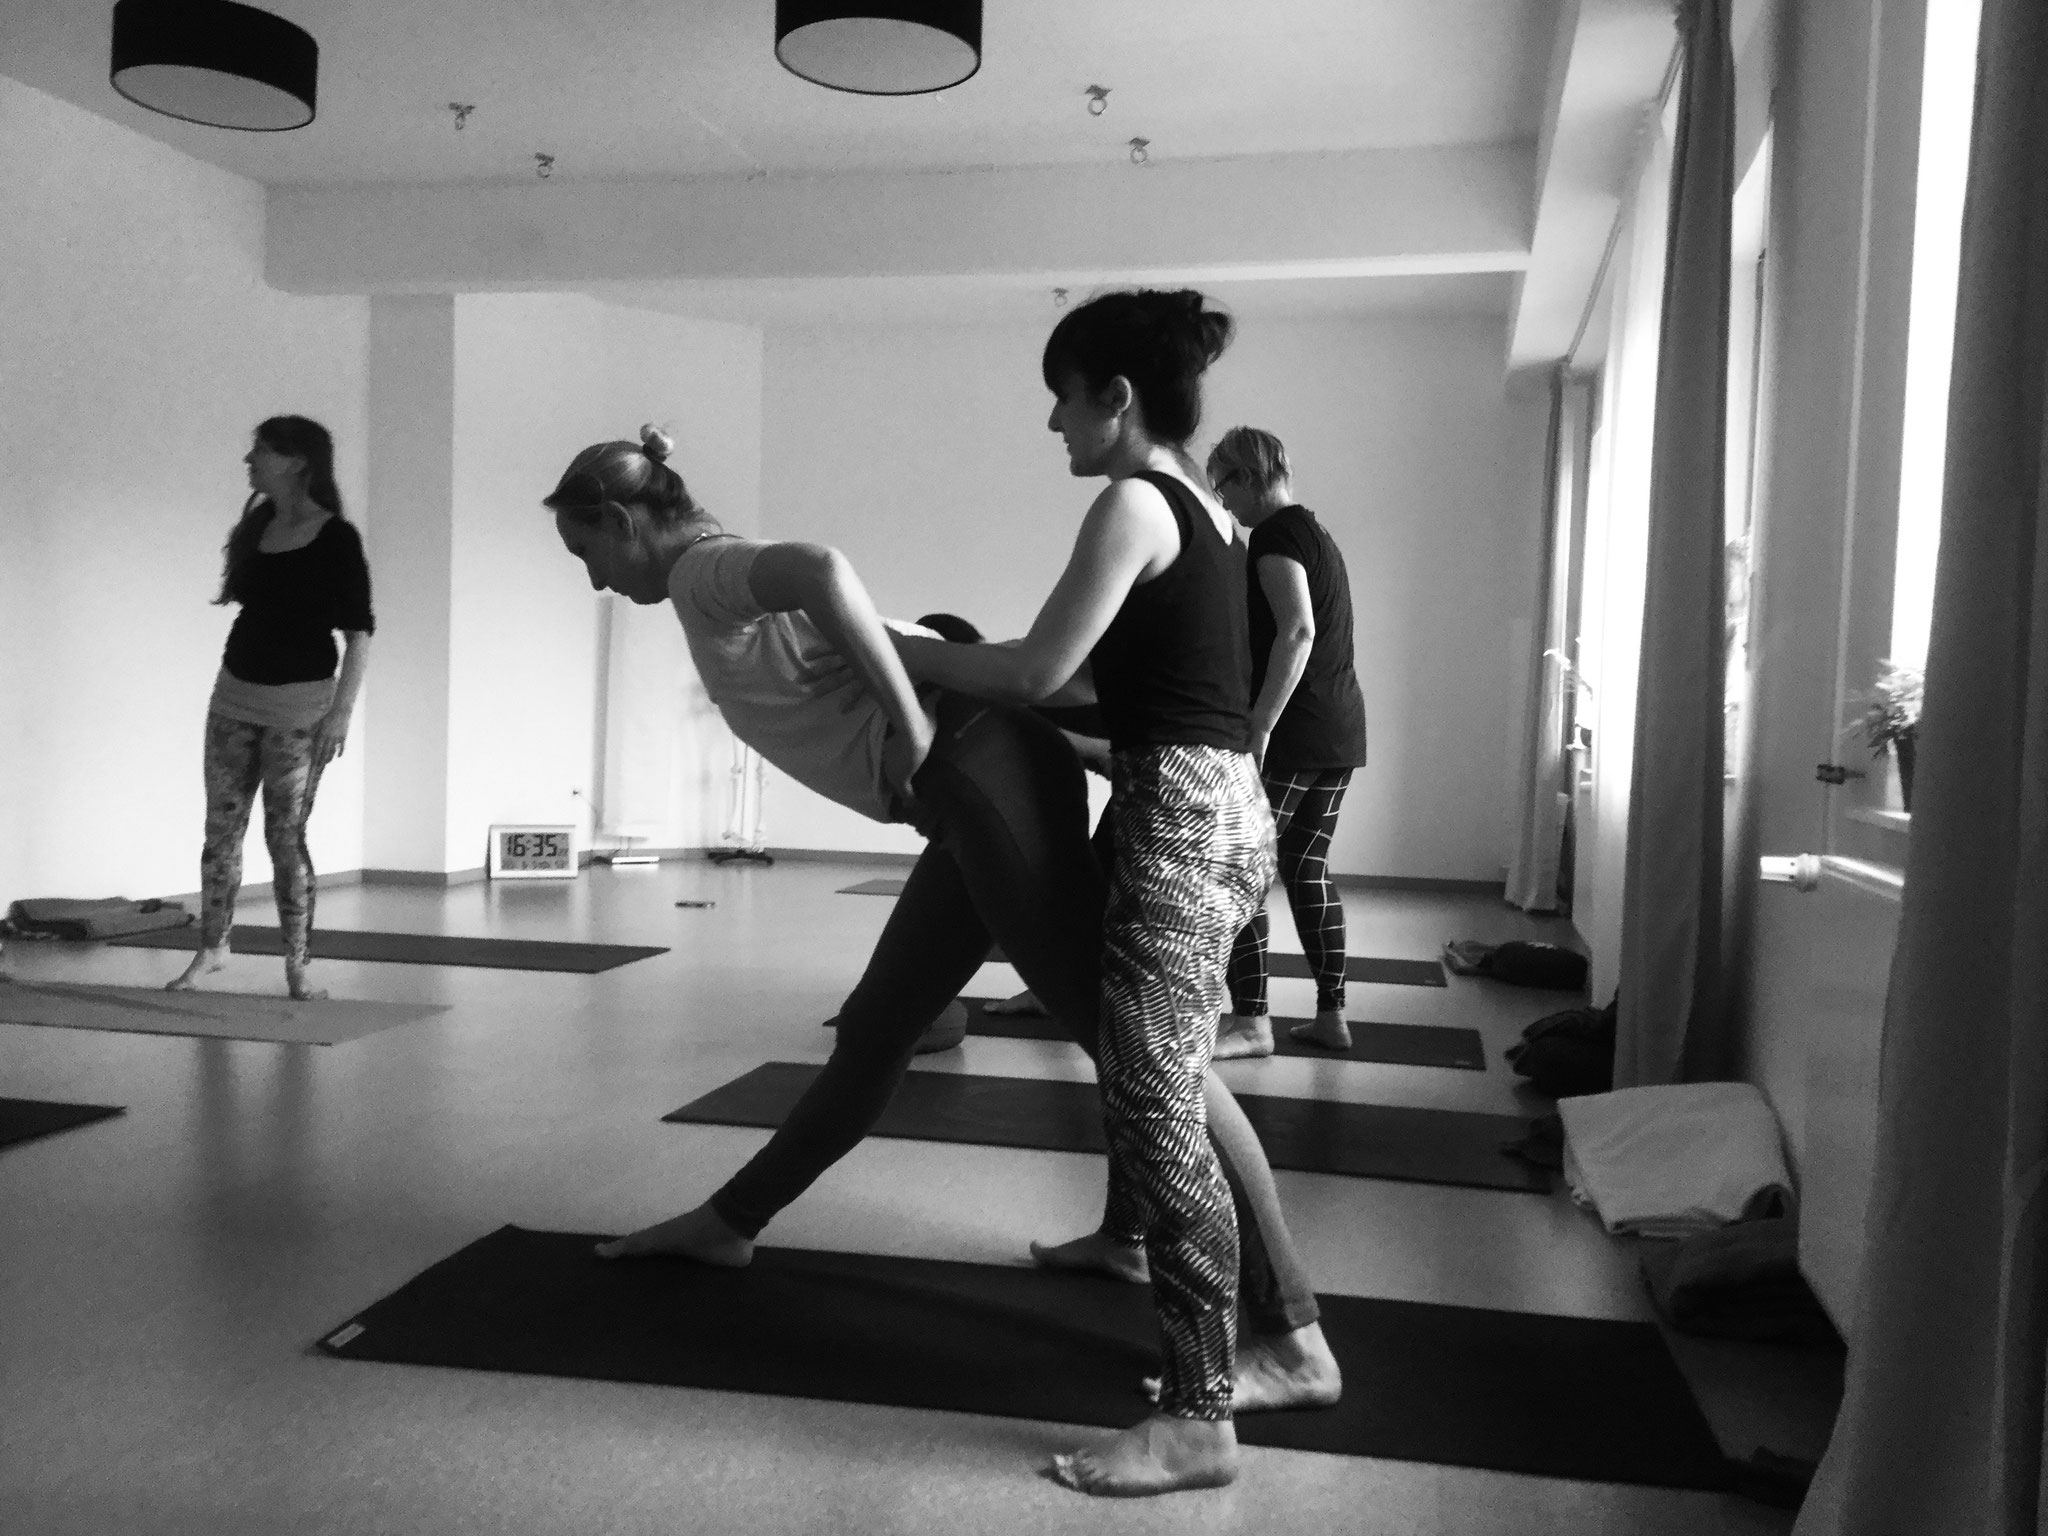 Yoga Asanas korrigieren im Chuck Miller Workshop bei Yamida - Yogaschule  Yoga Lüdinghausen, Datteln, Selm, Nordkirchen, Ascheberg, Cappenberg, Olfen, Senden